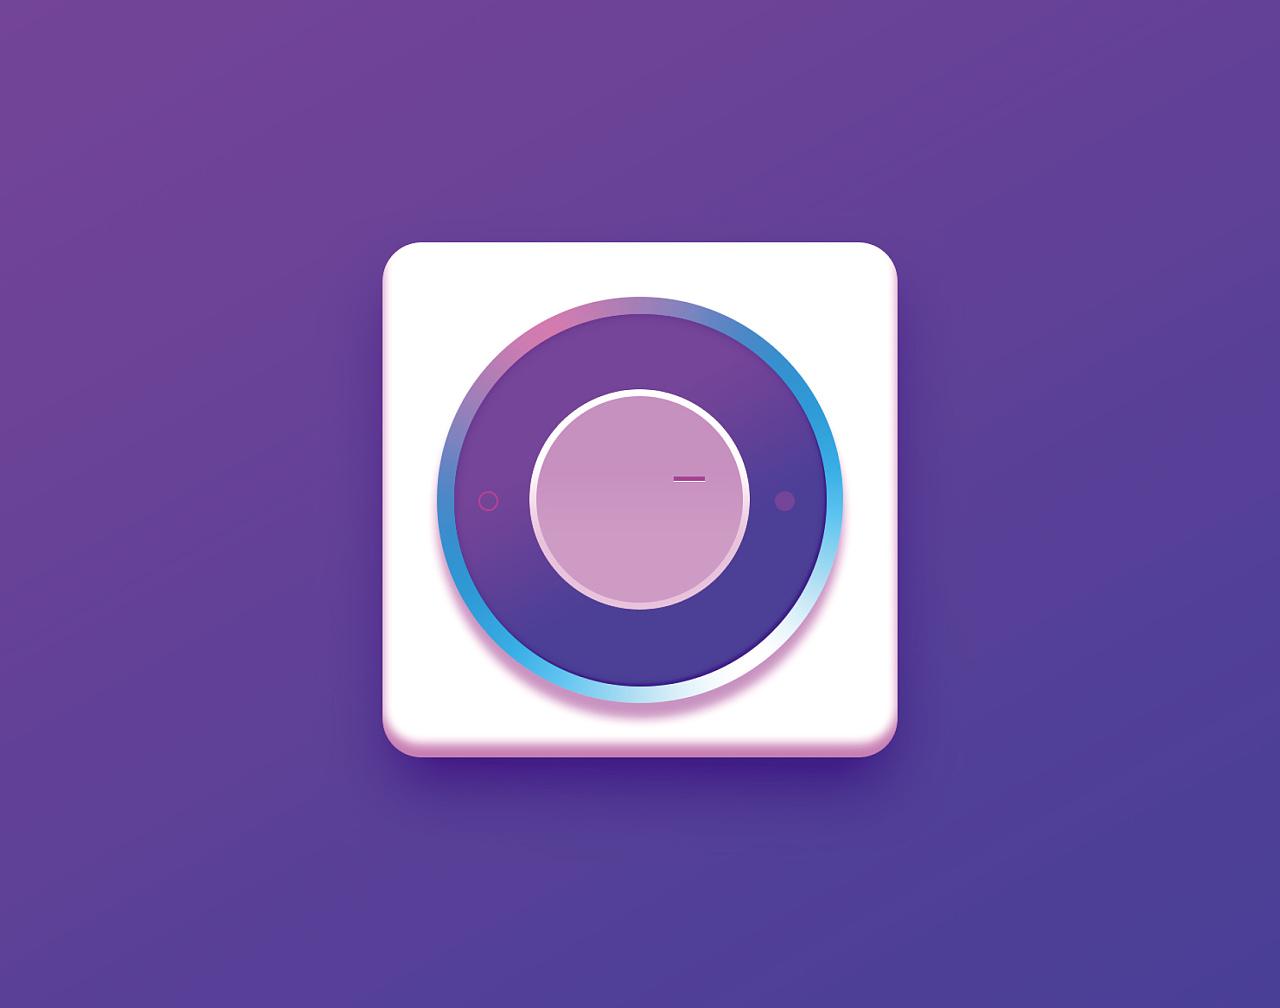 ico图标在线生成_icon图标 _排行榜大全